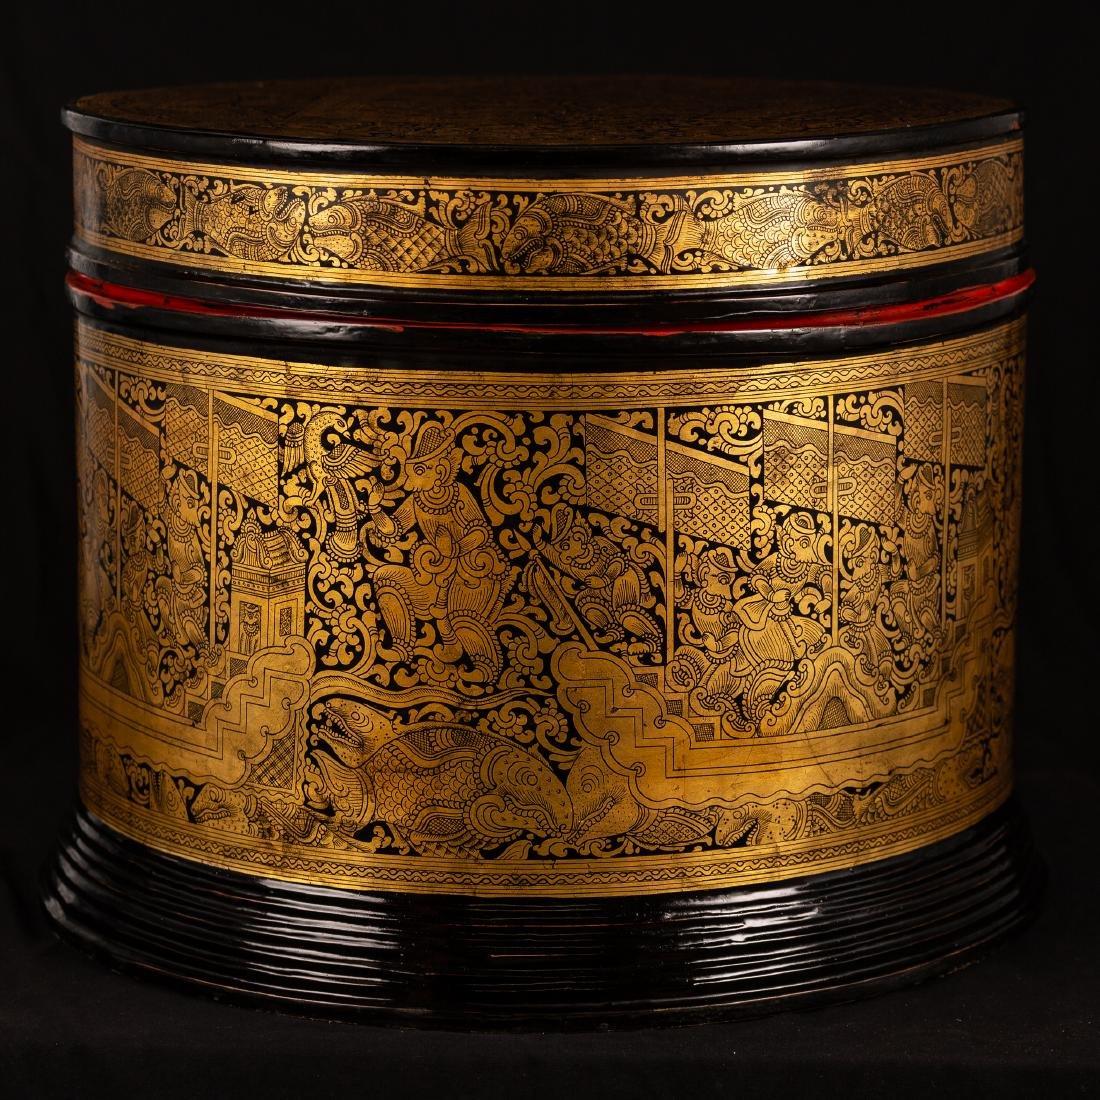 19th Century Burmese Lacquerware Monks Robe Box - 5